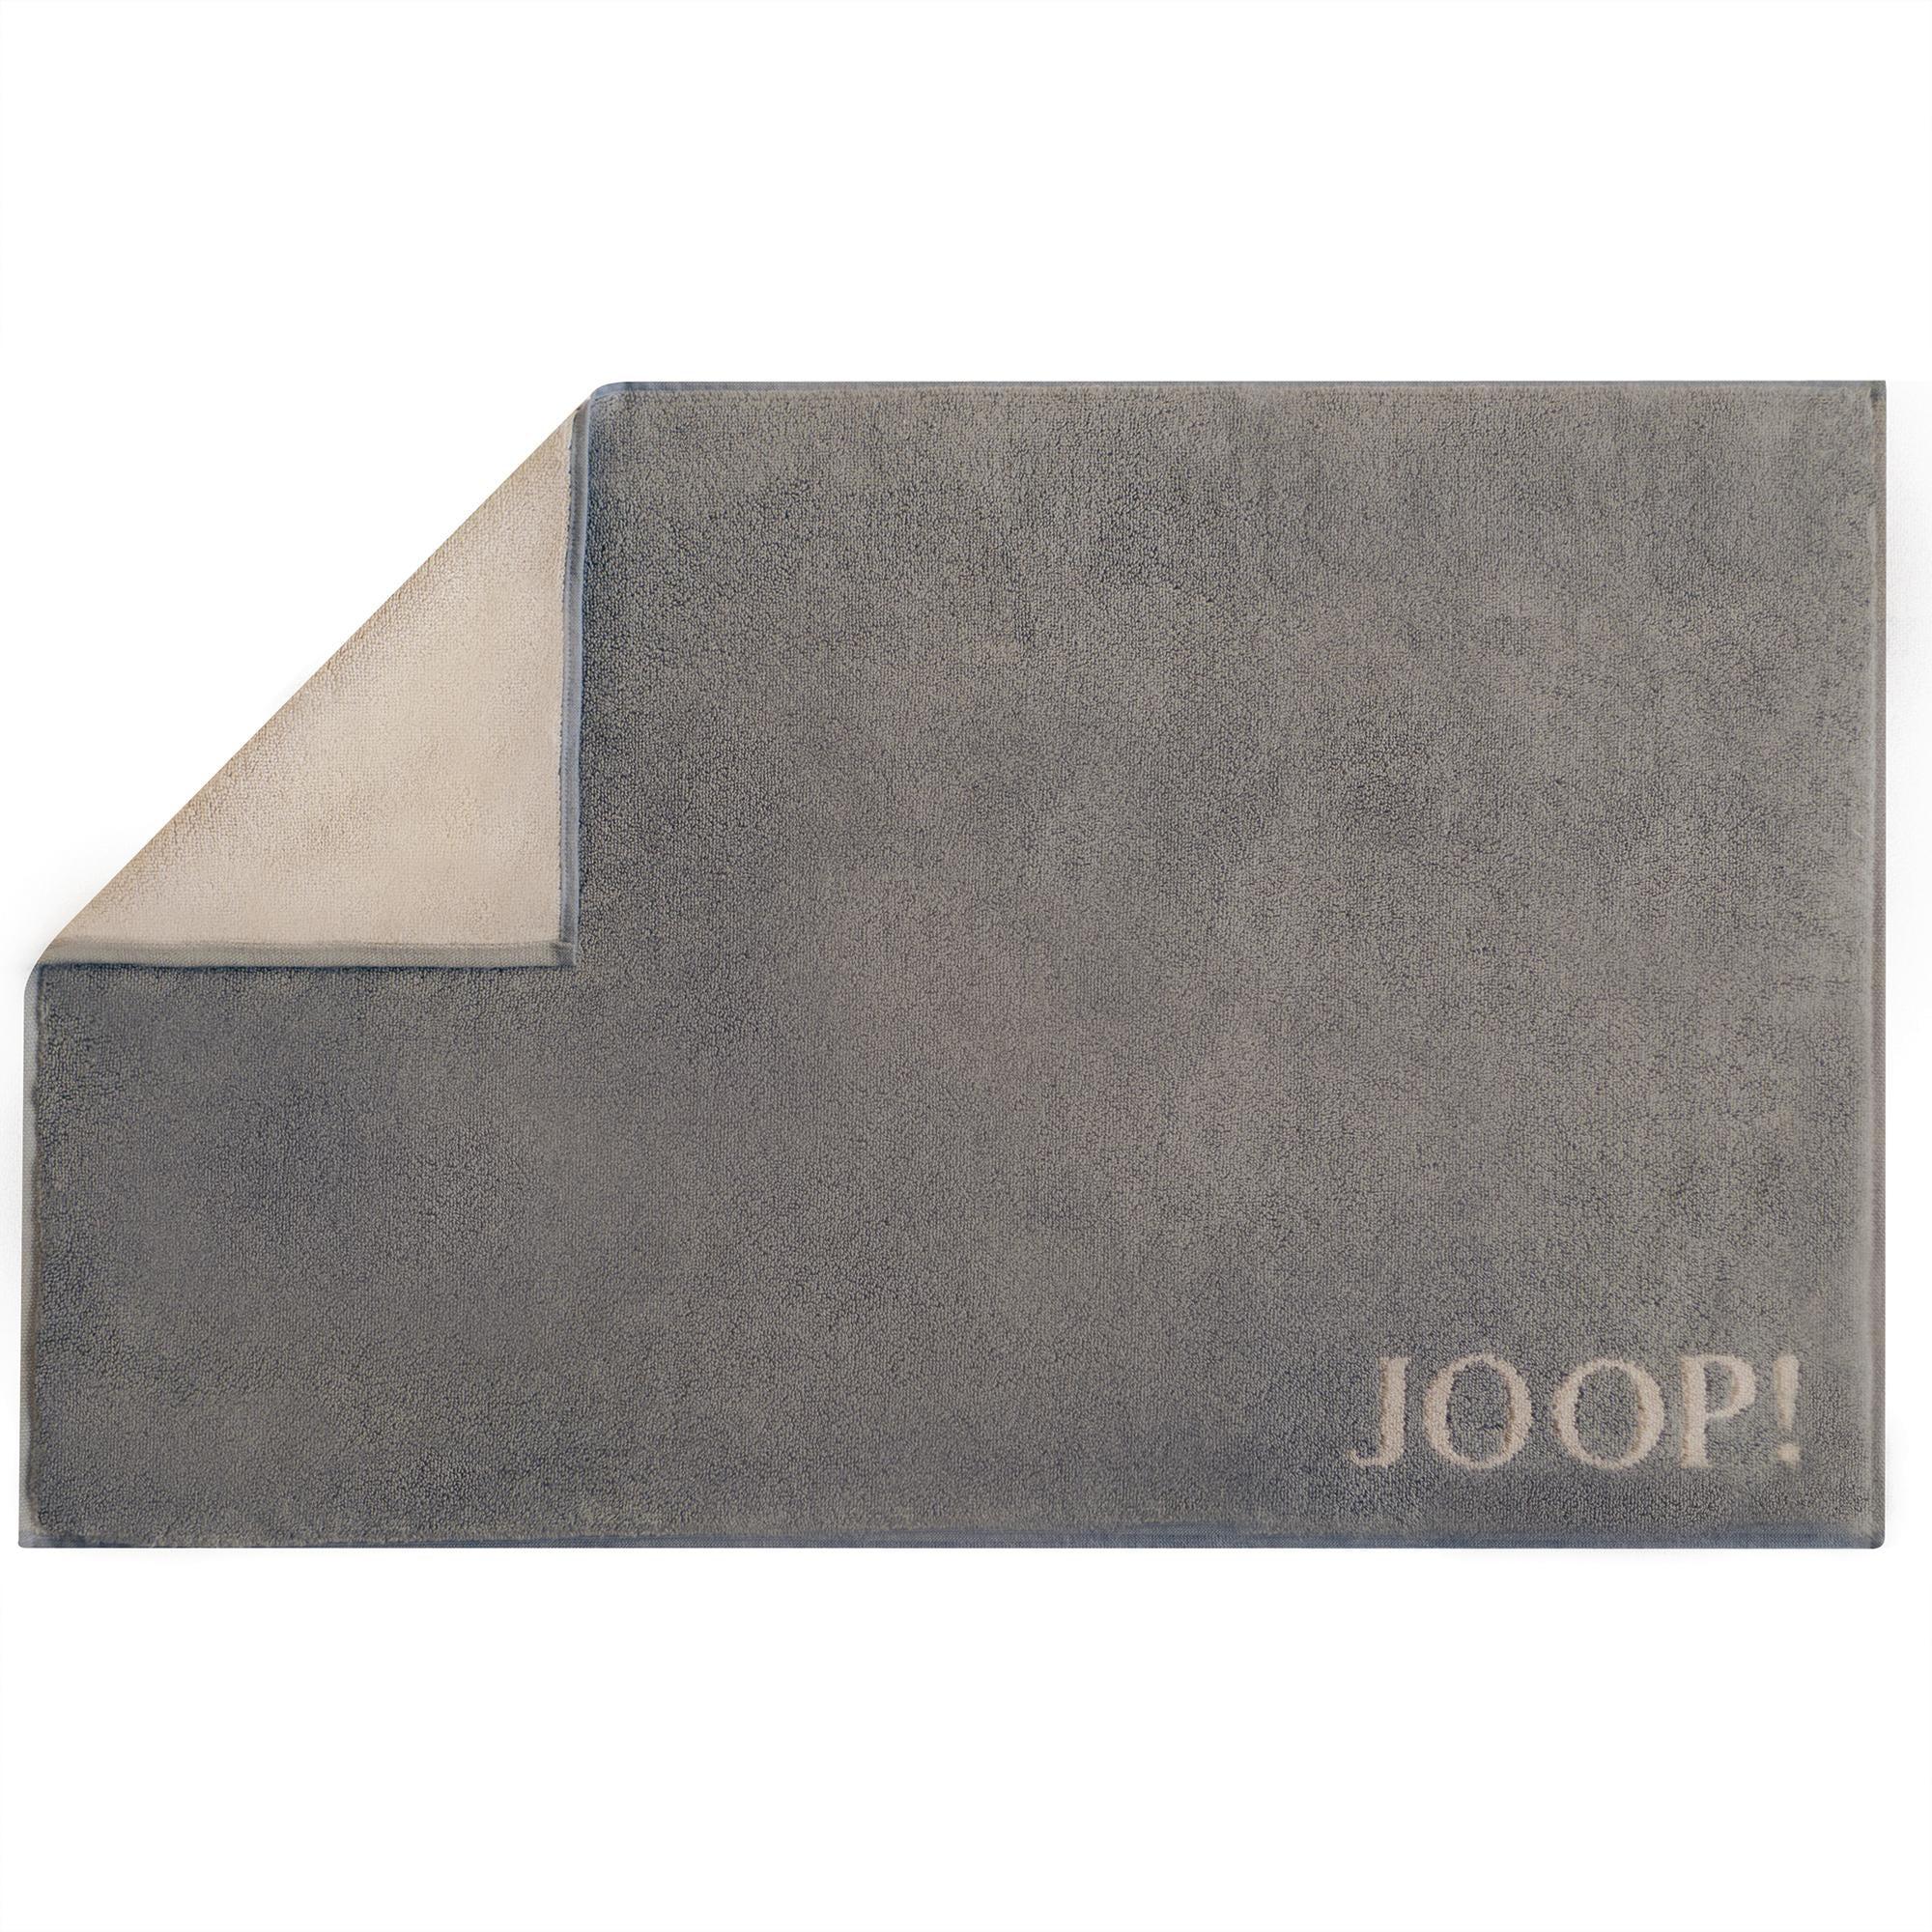 Badematte Doubleface, Joop, Höhe 4 mm, fußbodenheizungsgeeignet beidseitig nutzbar | Bad | Joop!